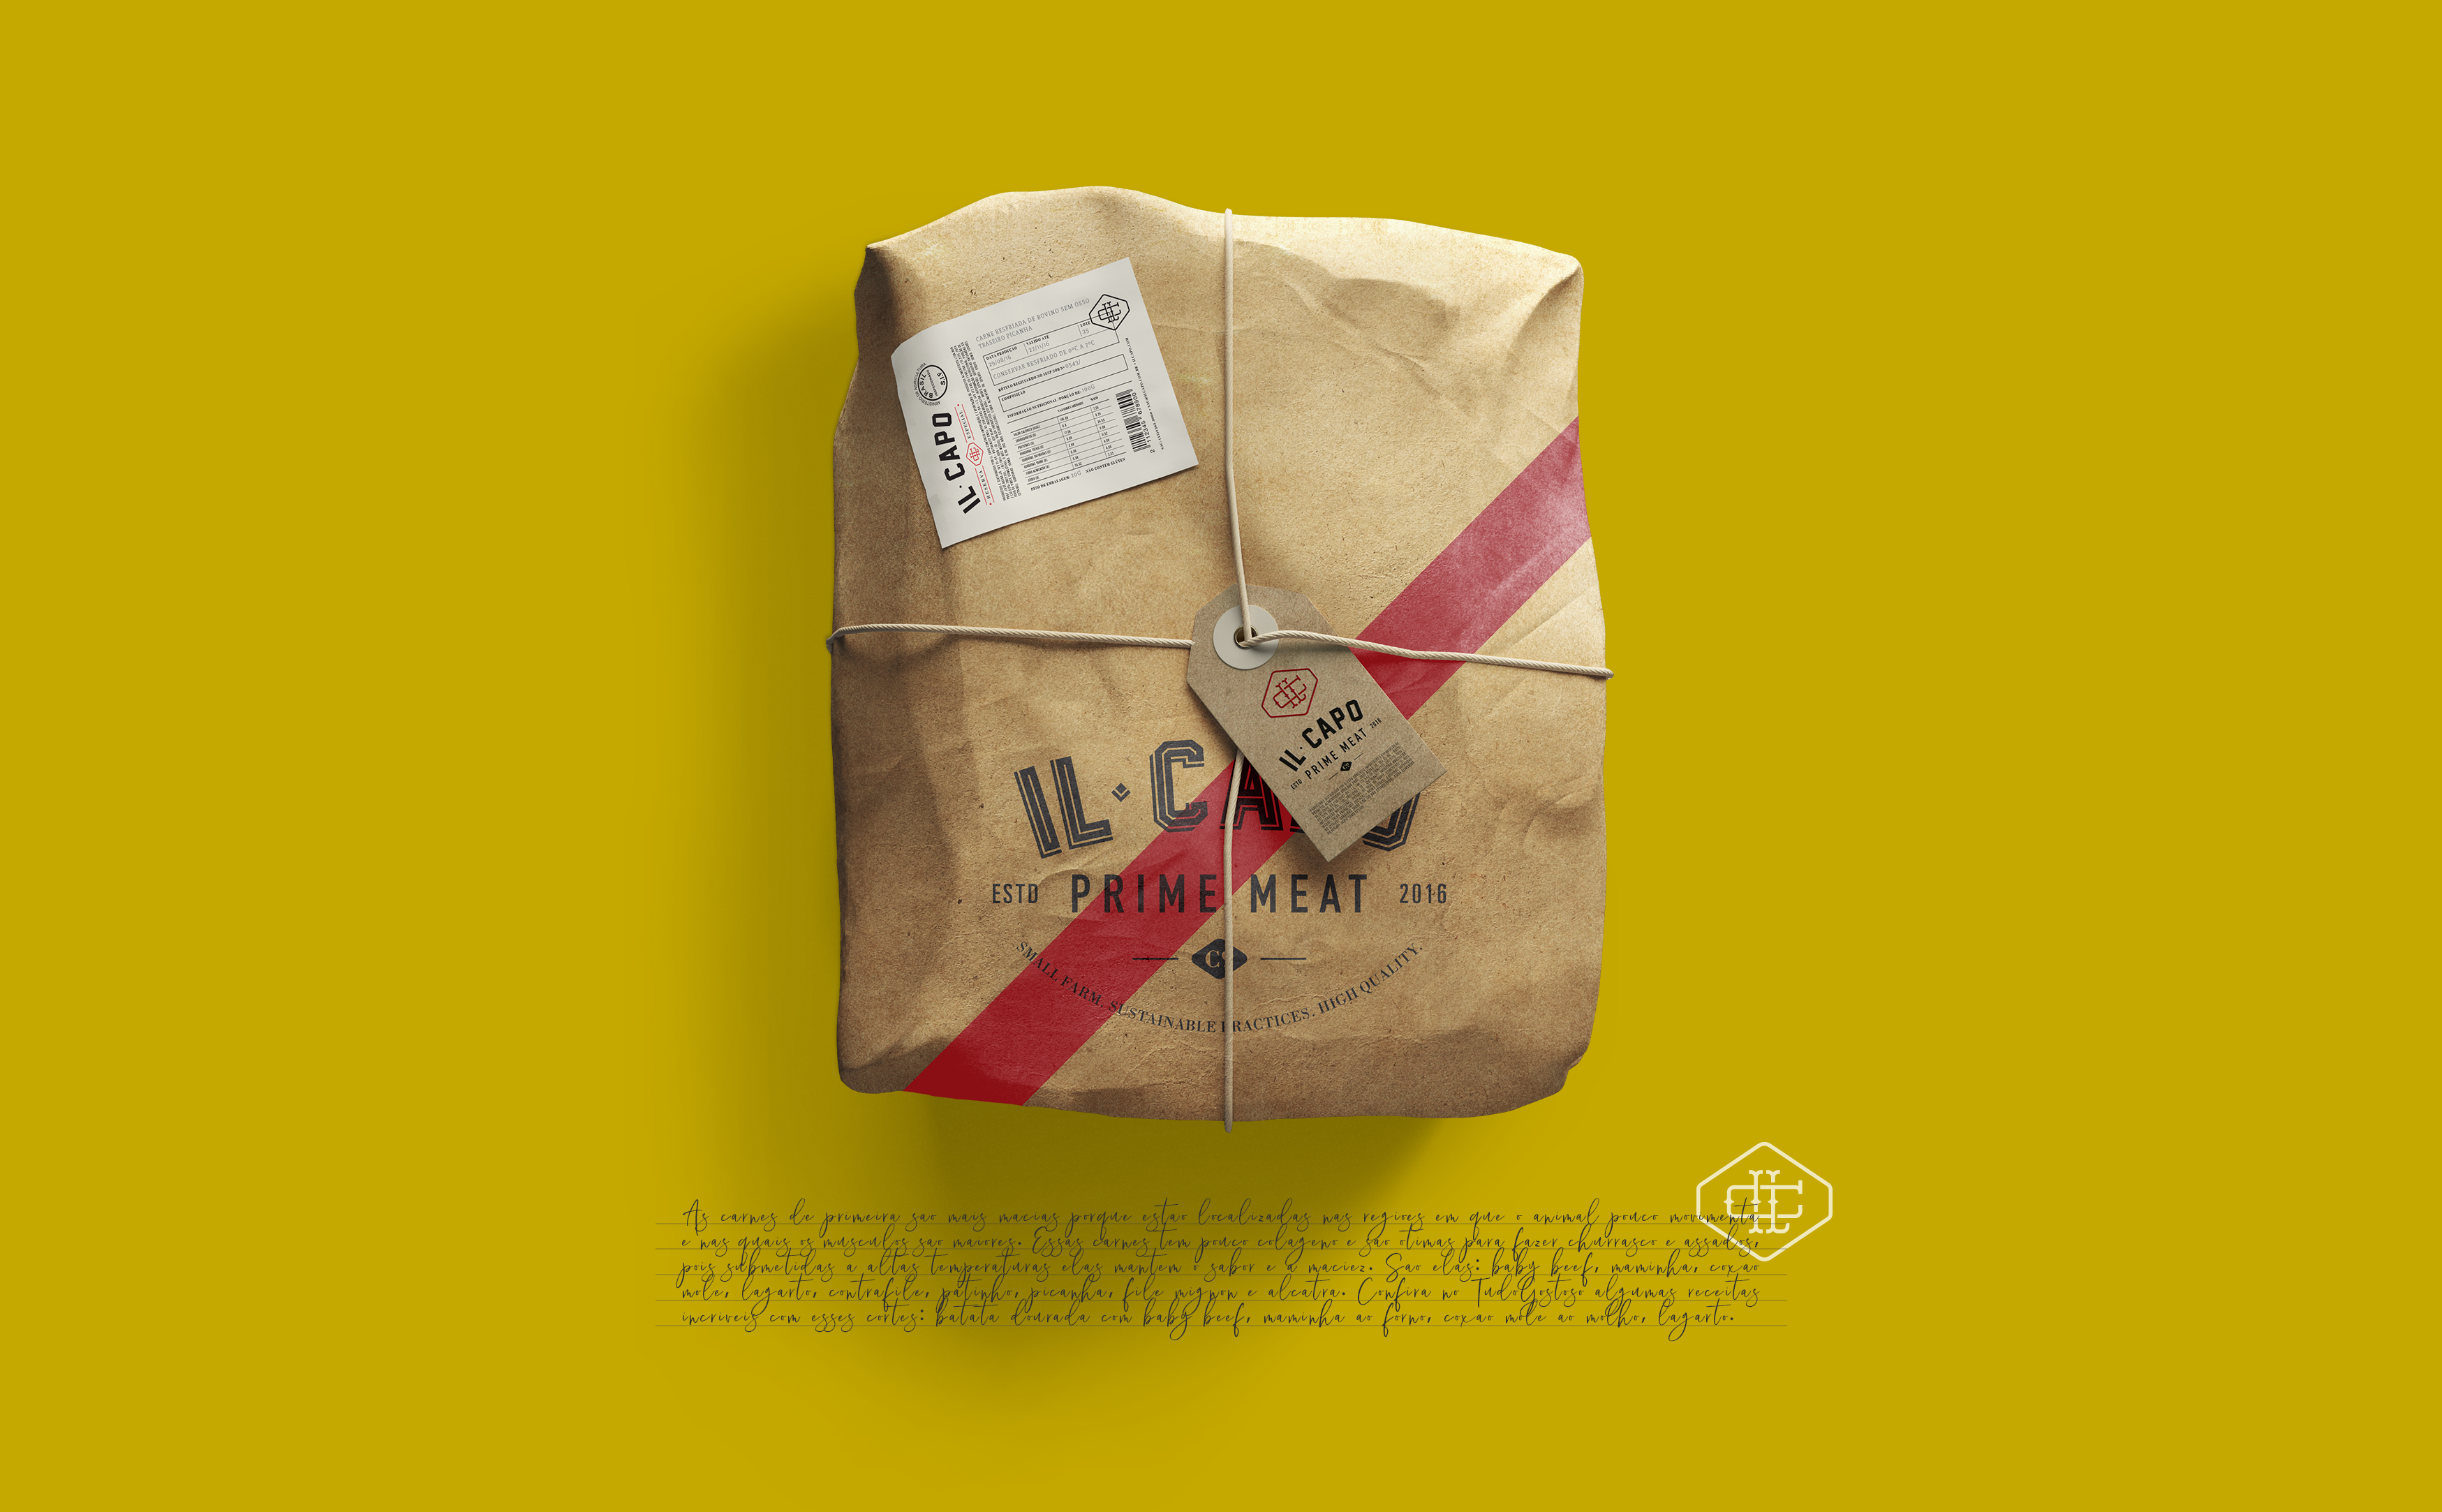 Branding_IlCapo_01A